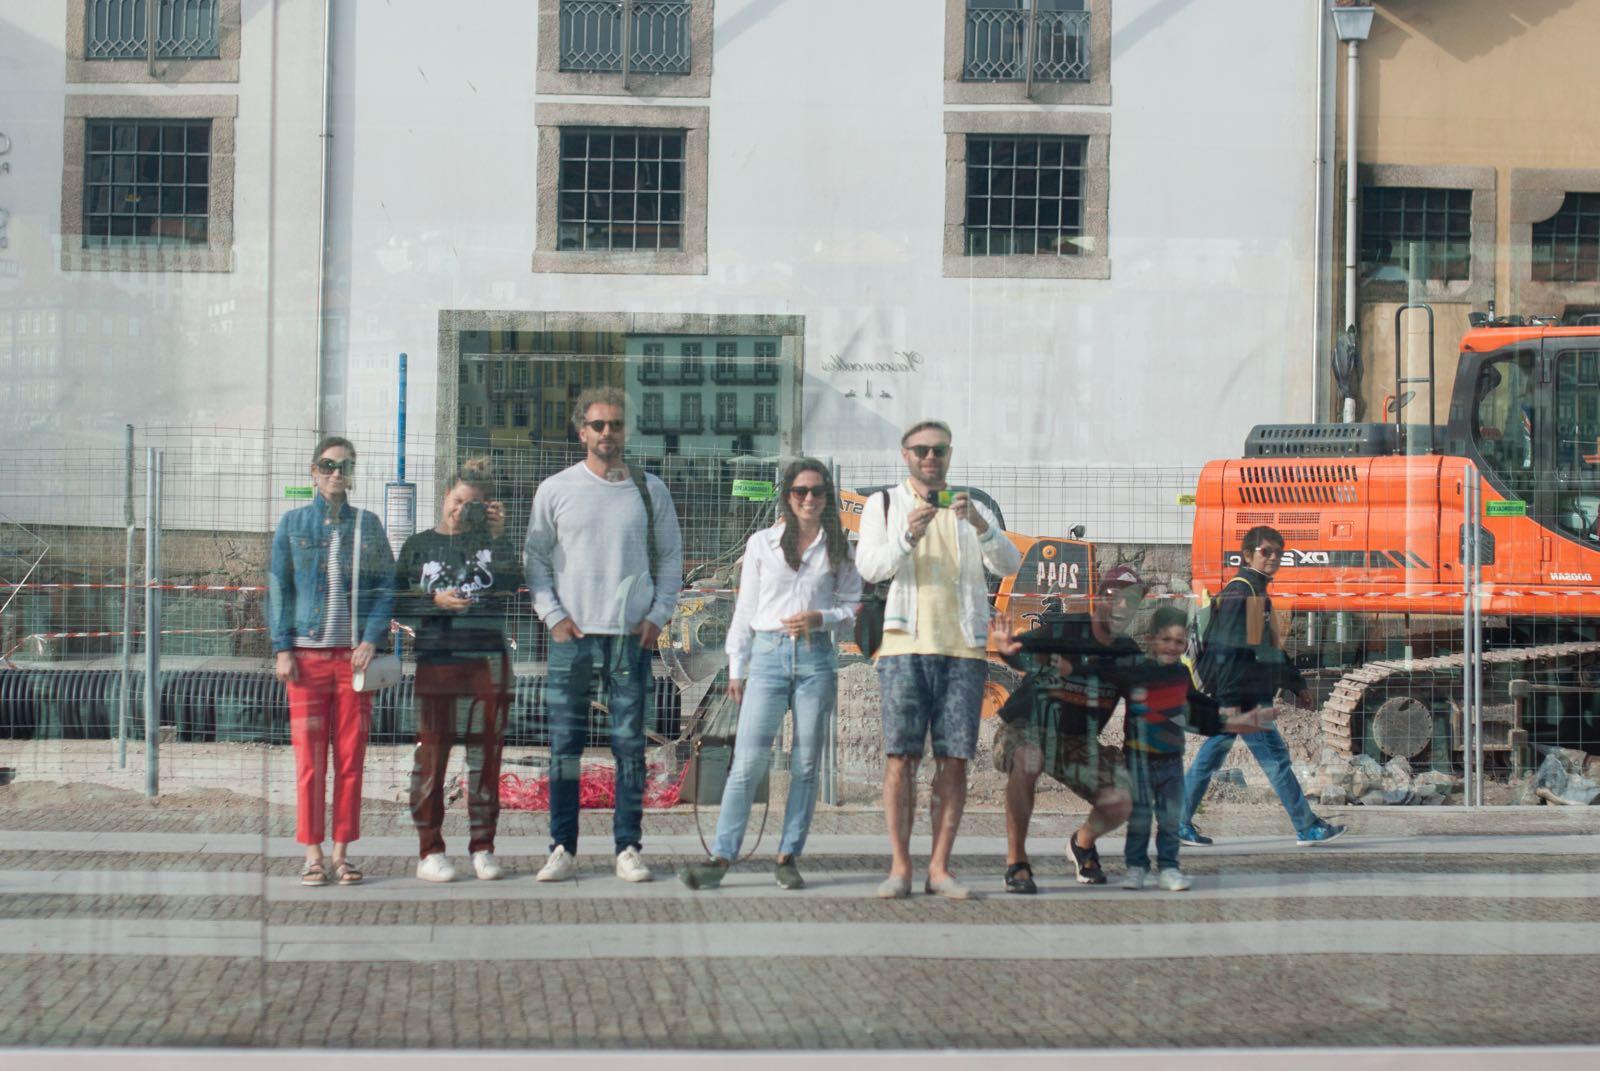 Portugal Wine Travel Guide. Our Porto Team